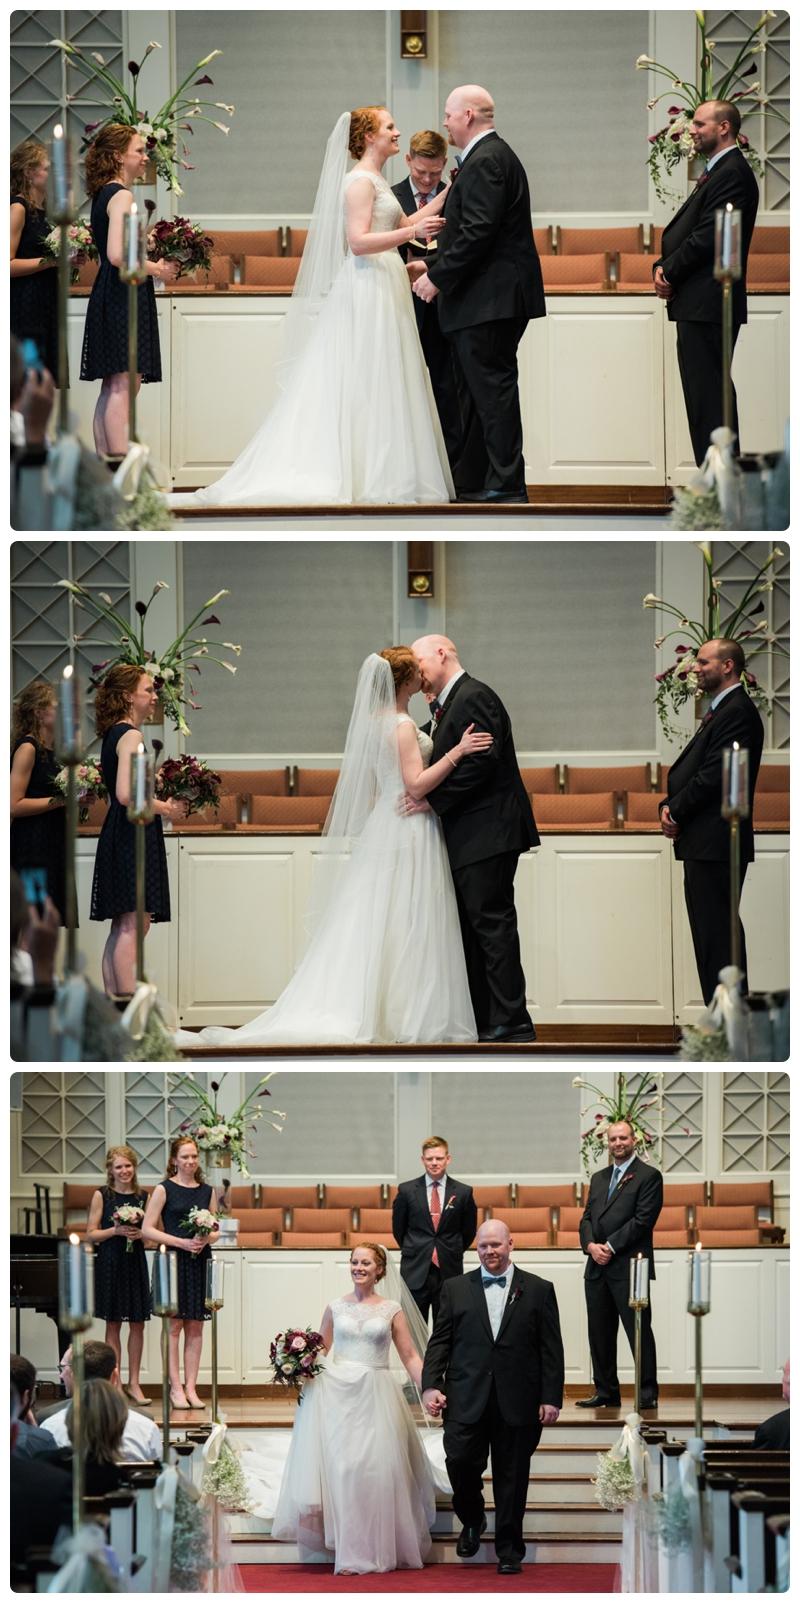 Wedding in Falls Church Virginia by Rachael Foster Photography_0019.jpg